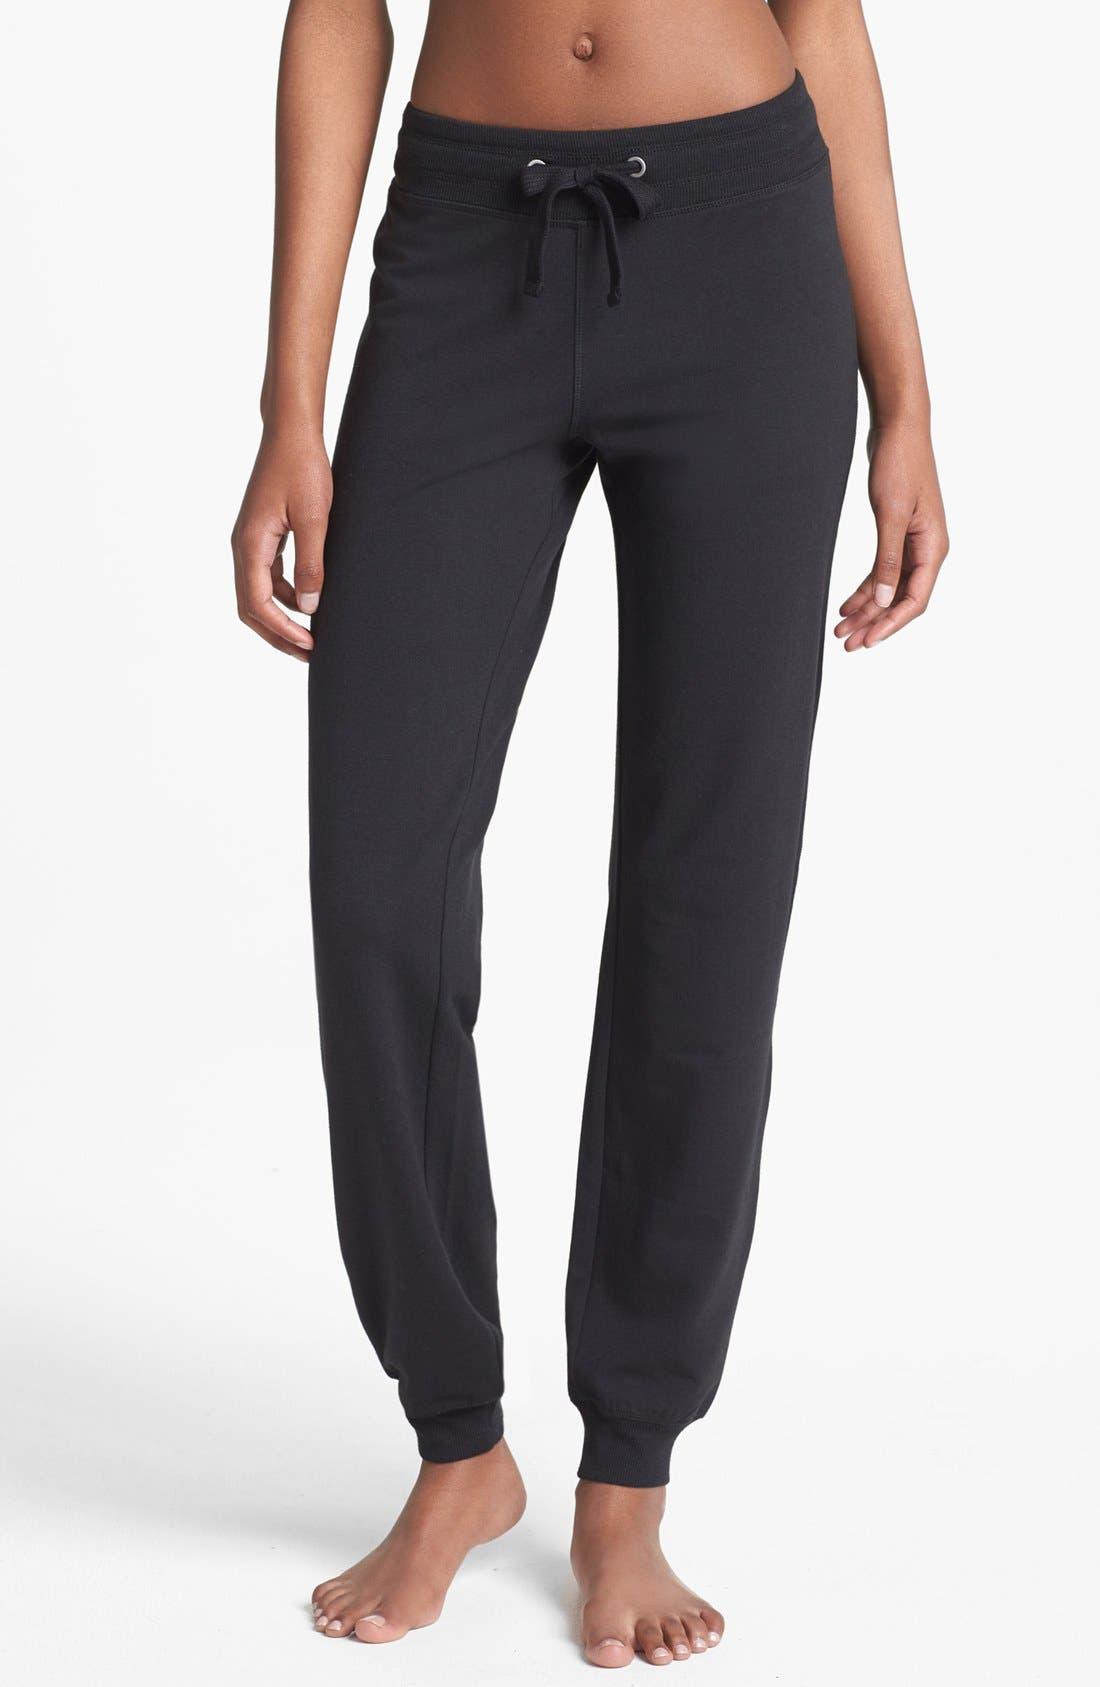 Main Image - Alo 'Cozy' Slim Sweatpants